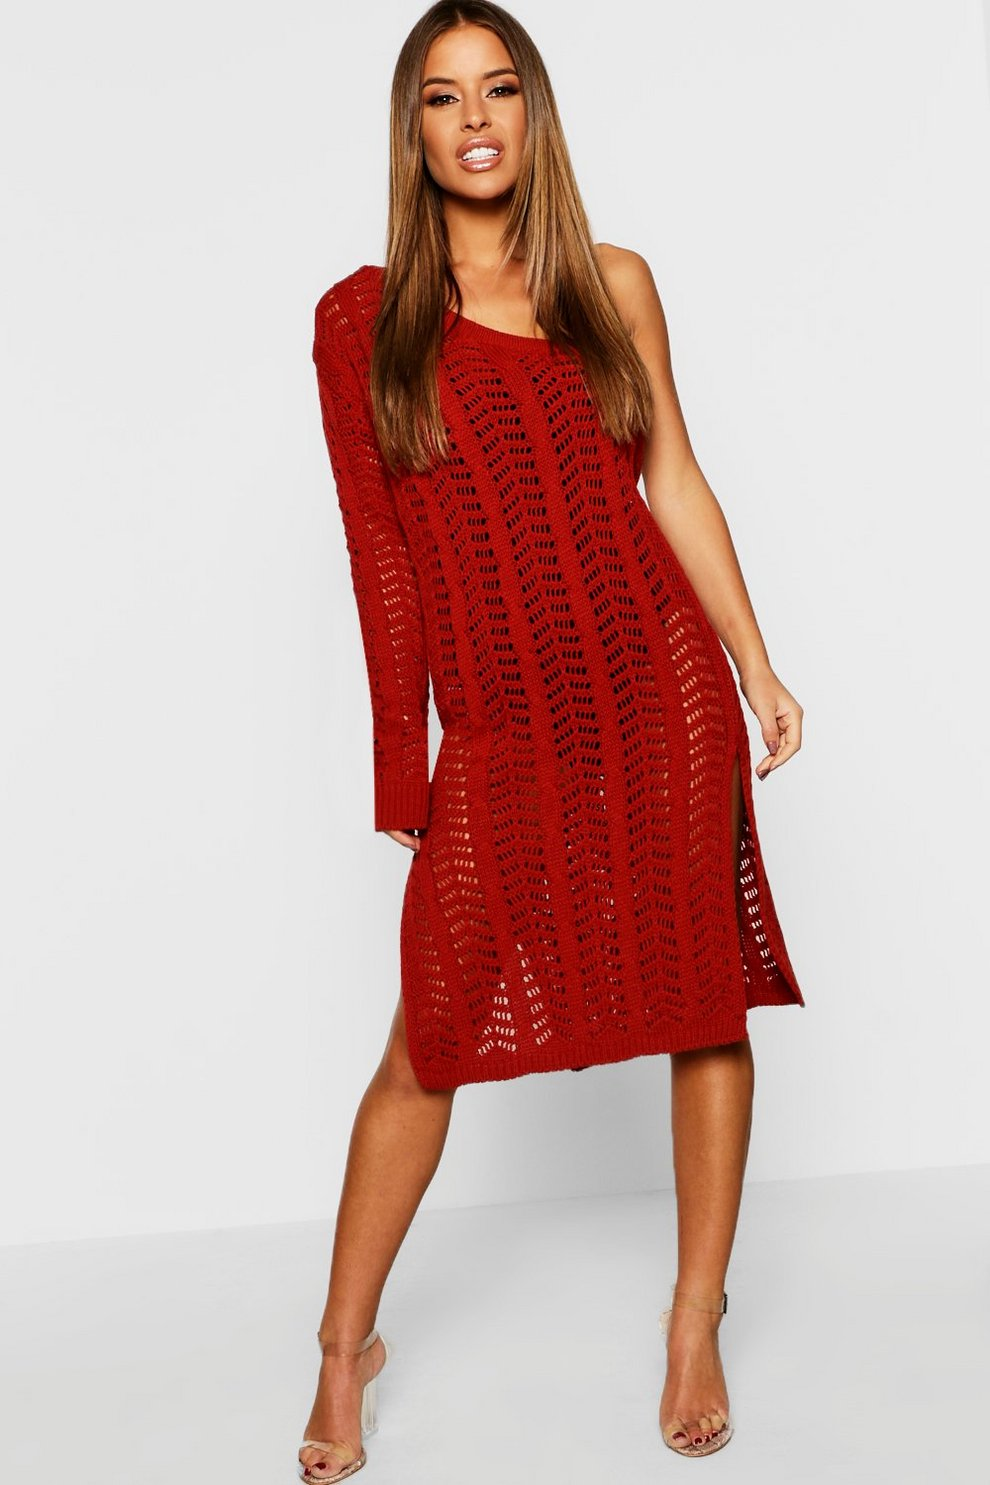 b98eba3e6d28 Petite One Shoulder Knitted Dress | Boohoo